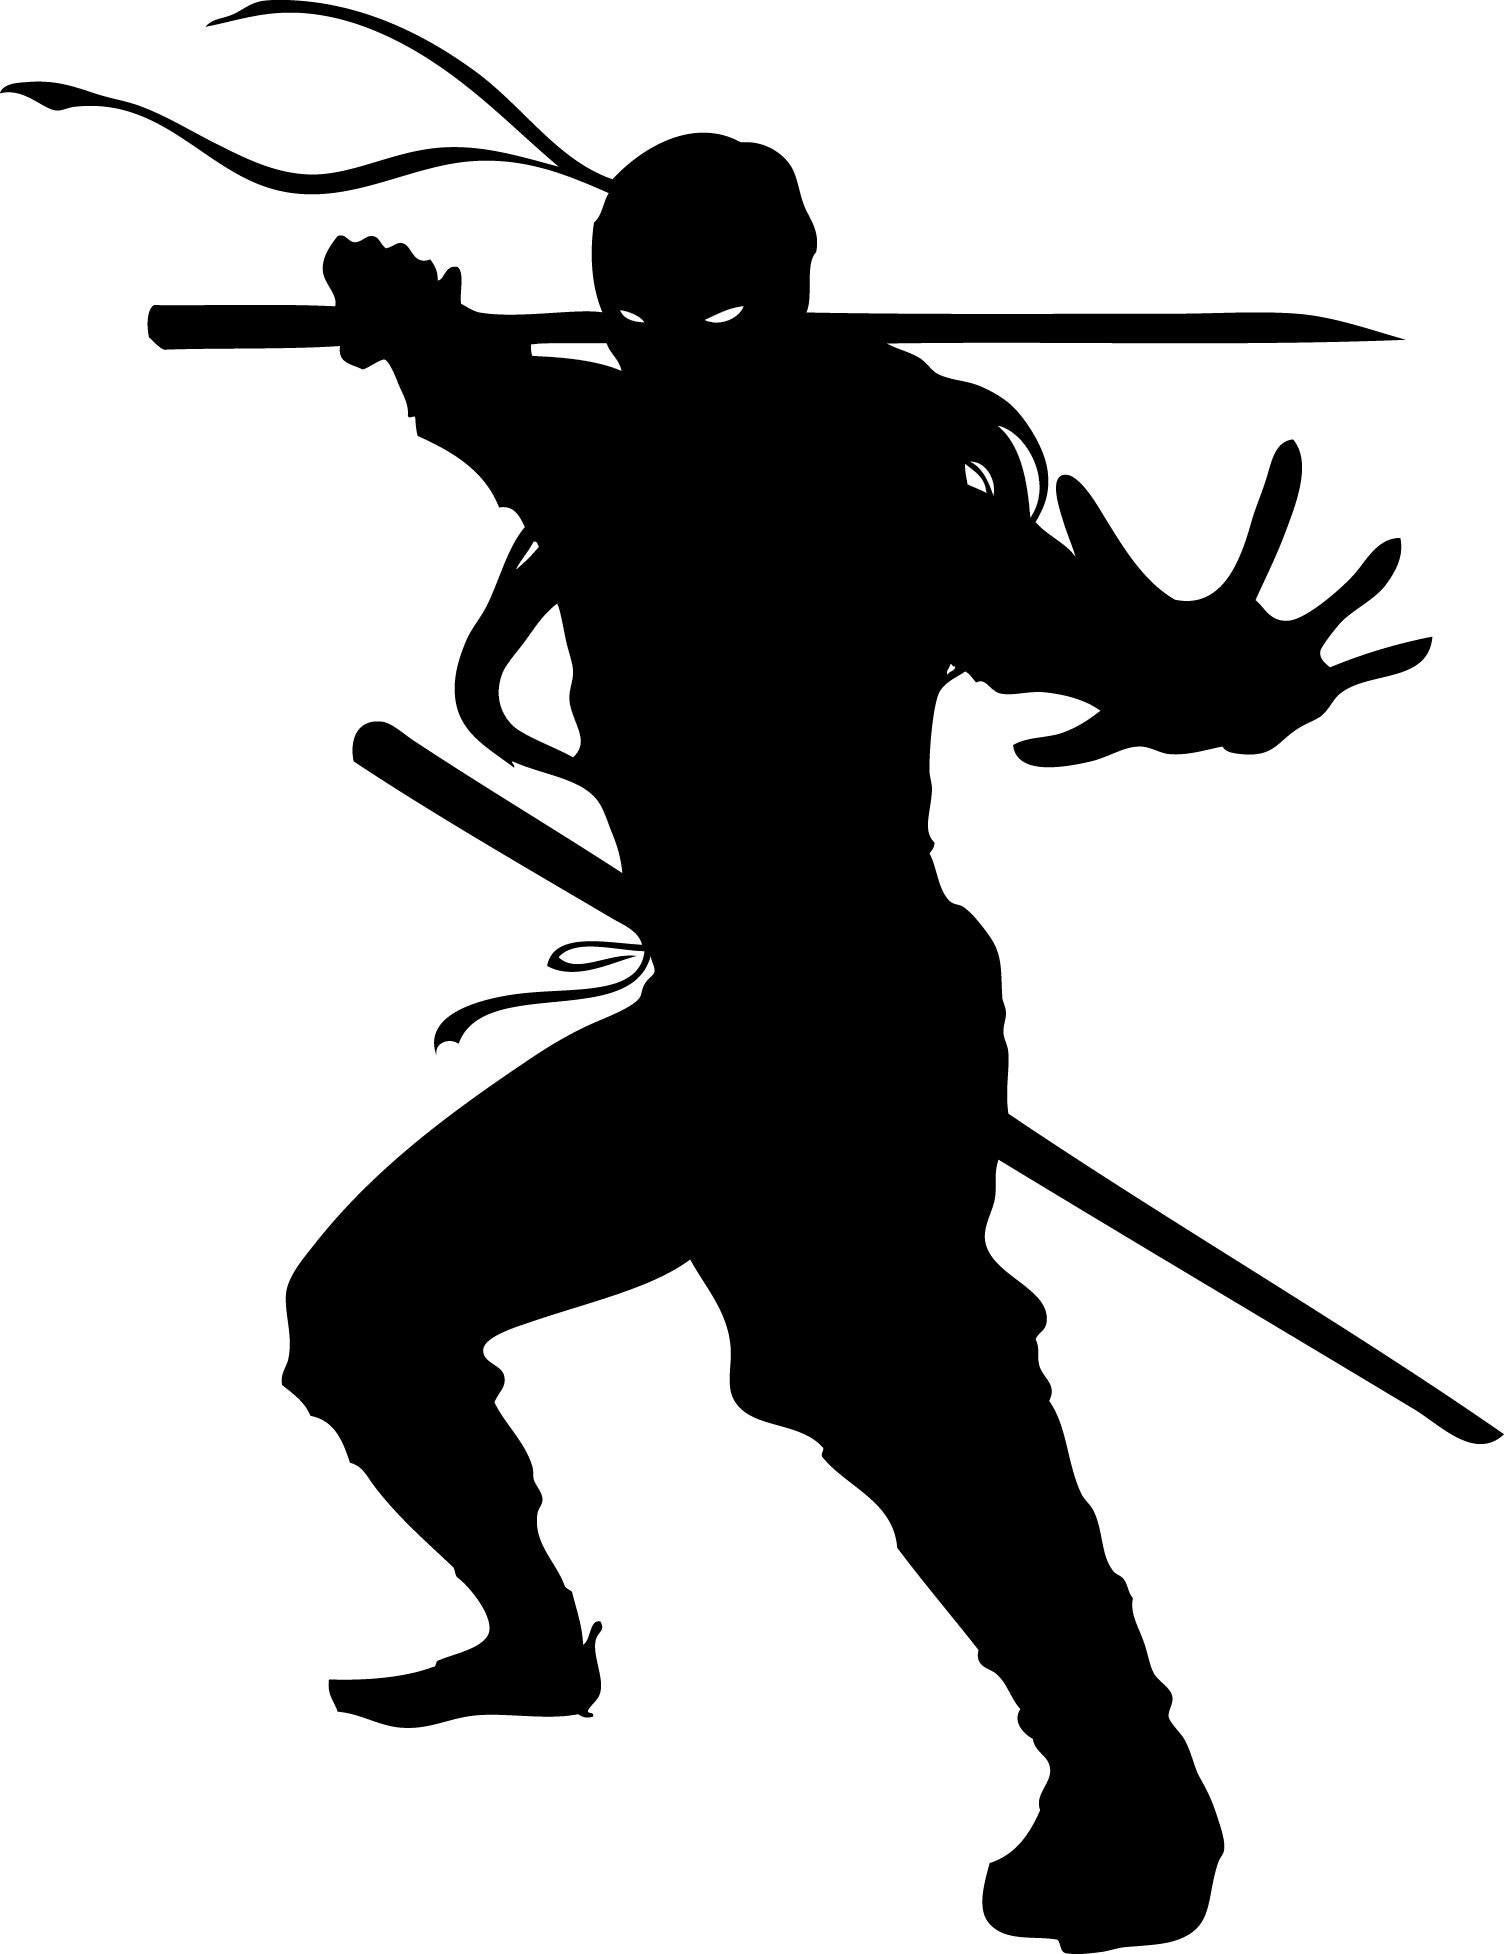 Japanese clipart ninja. Hd png transparent images